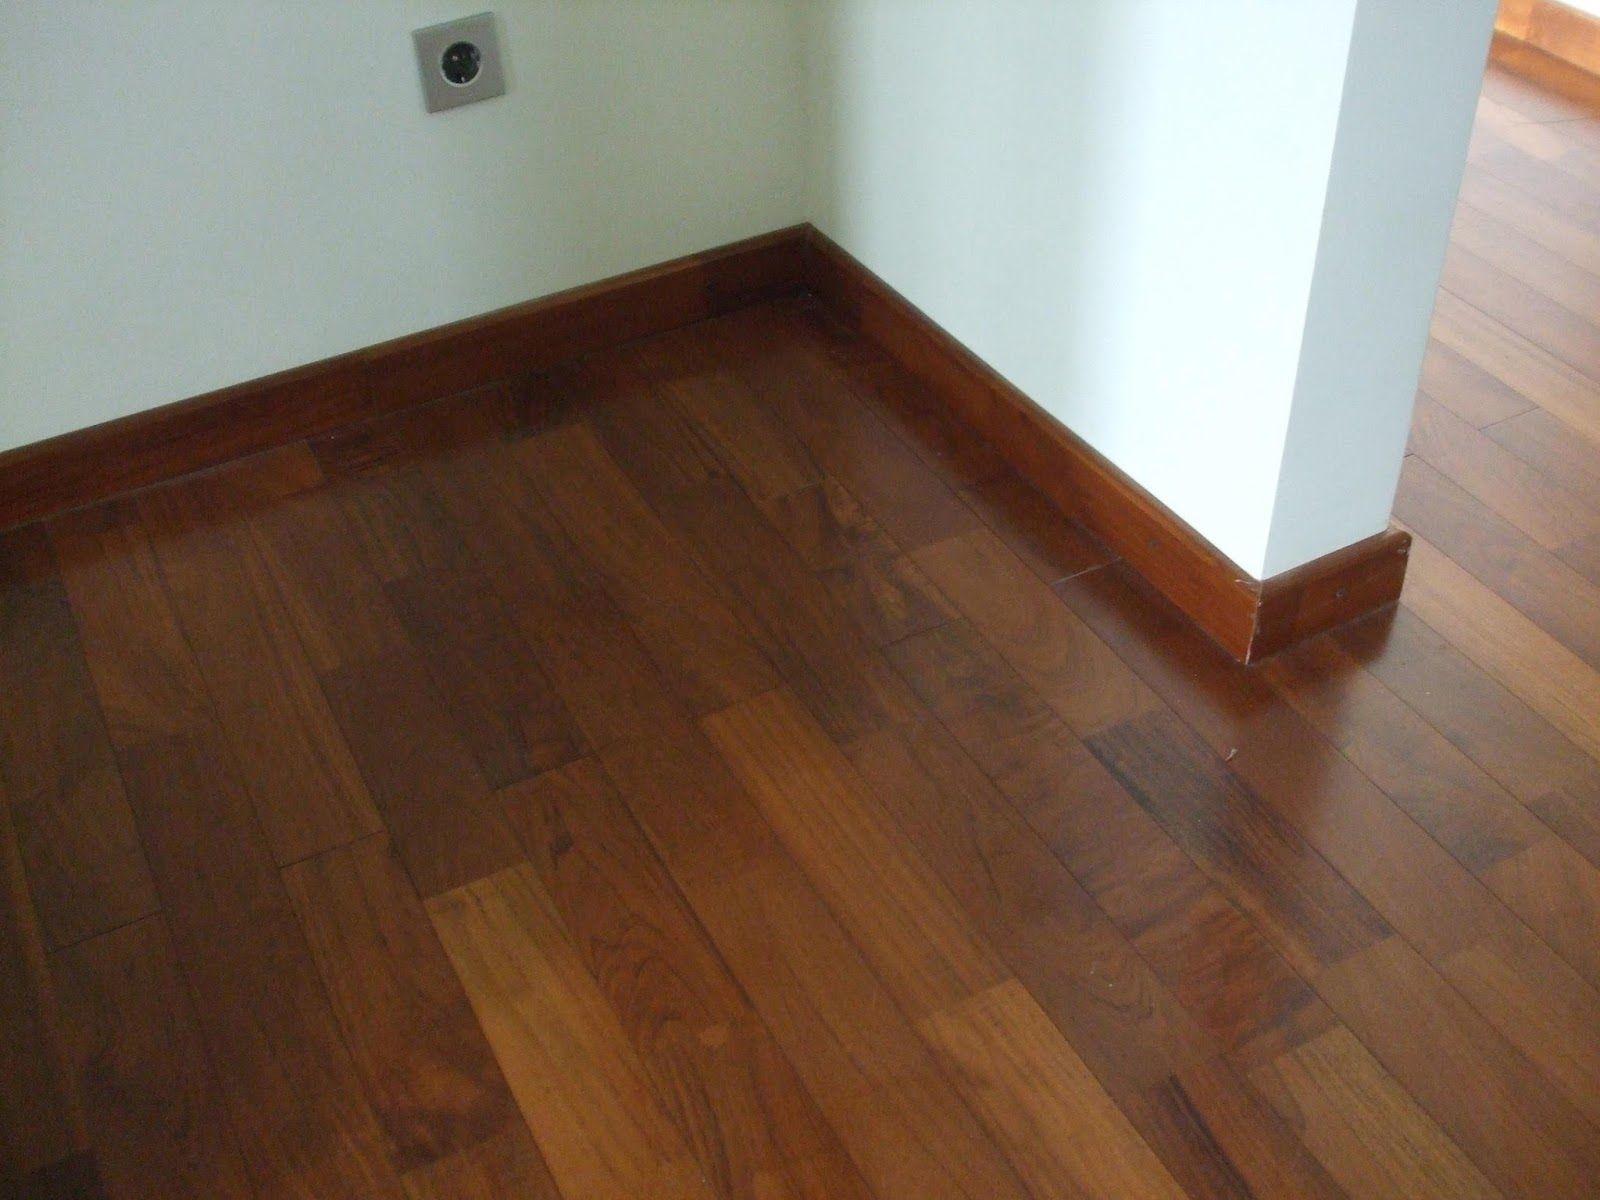 harga lantai keramik motif kayu